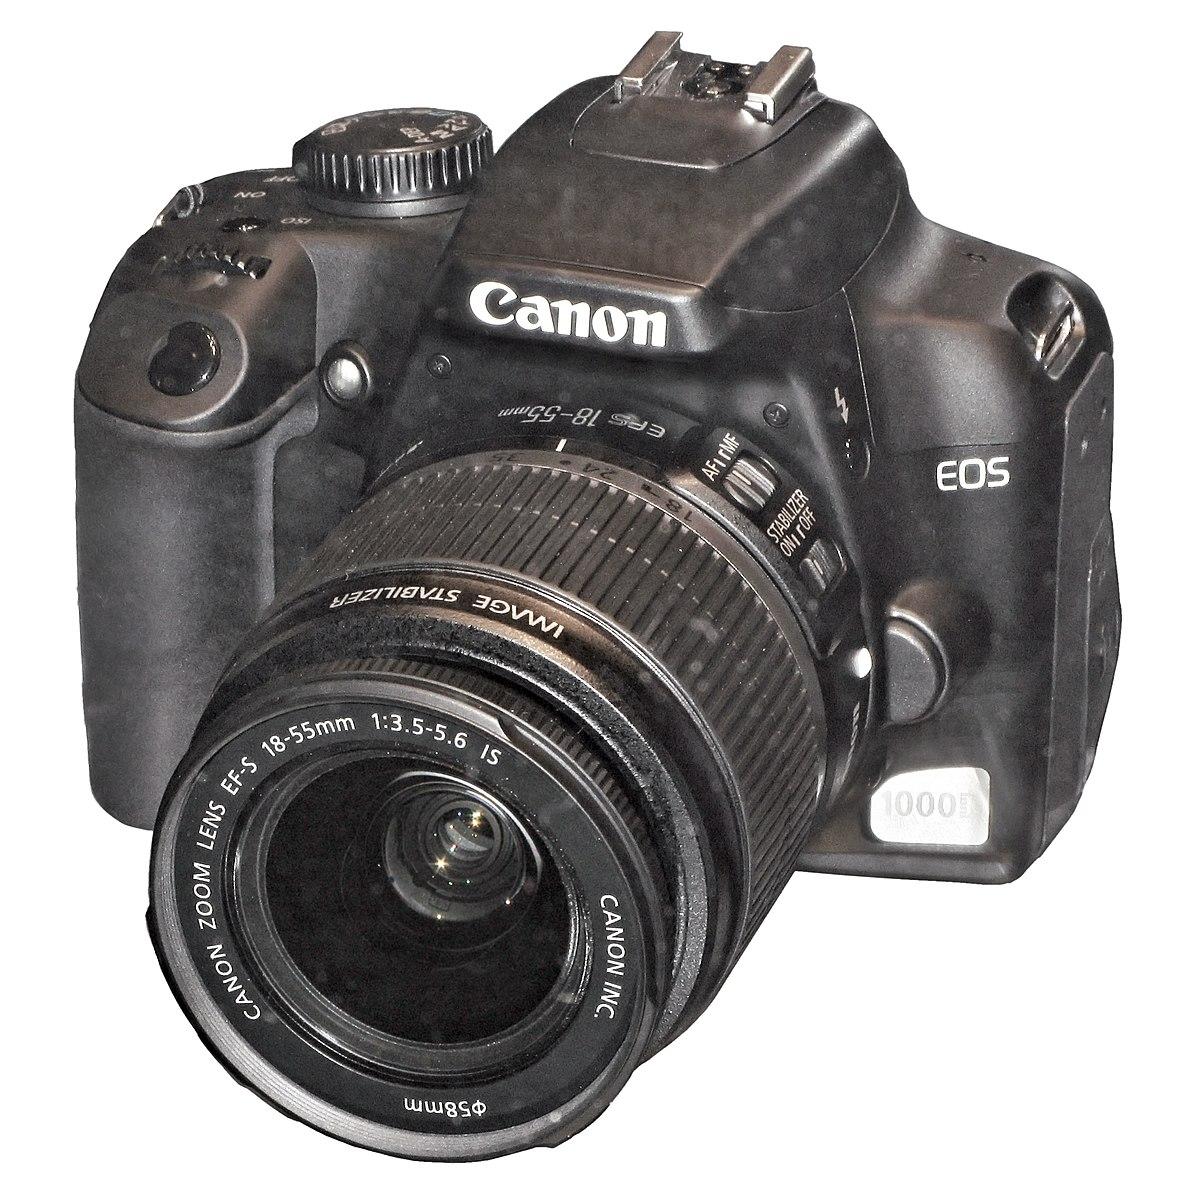 canon eos 1000d wikipedia rh en wikipedia org Canon EOS 500D Astrophotography Images Canon EOS 550D Flash